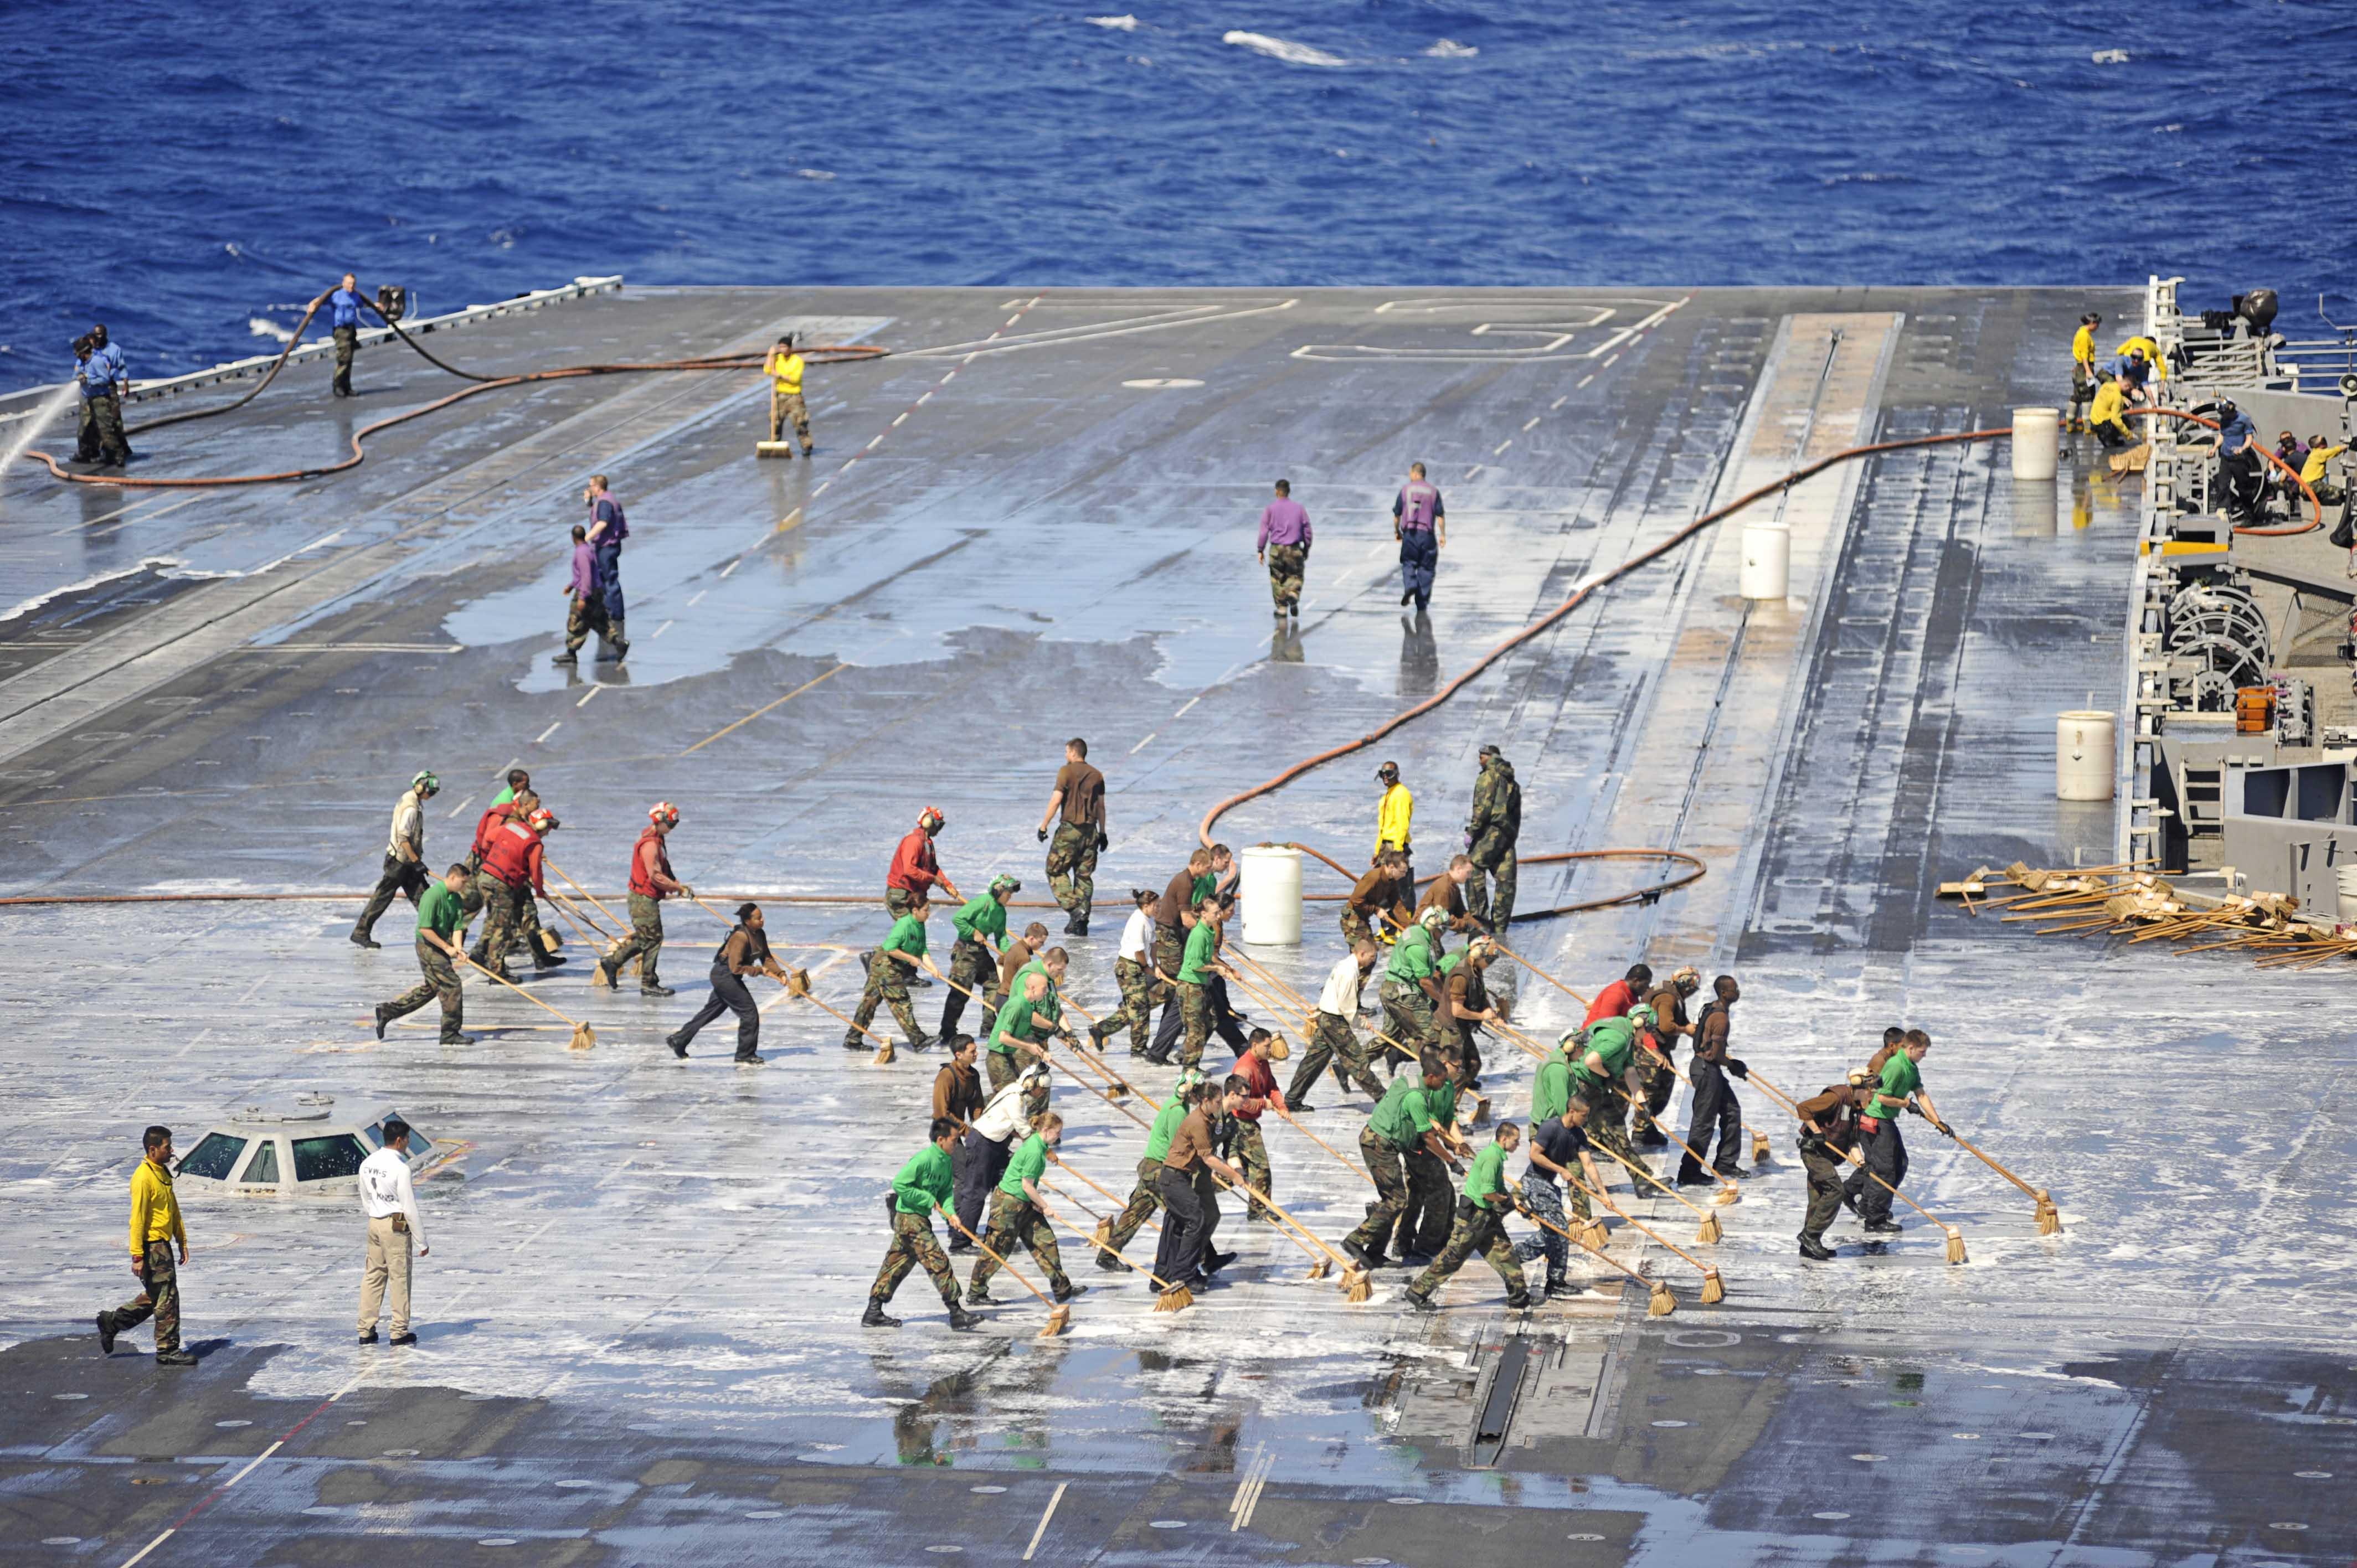 FileUS Navy 110824 N BR887 045 Sailors wash down the flight deck 4256x2832